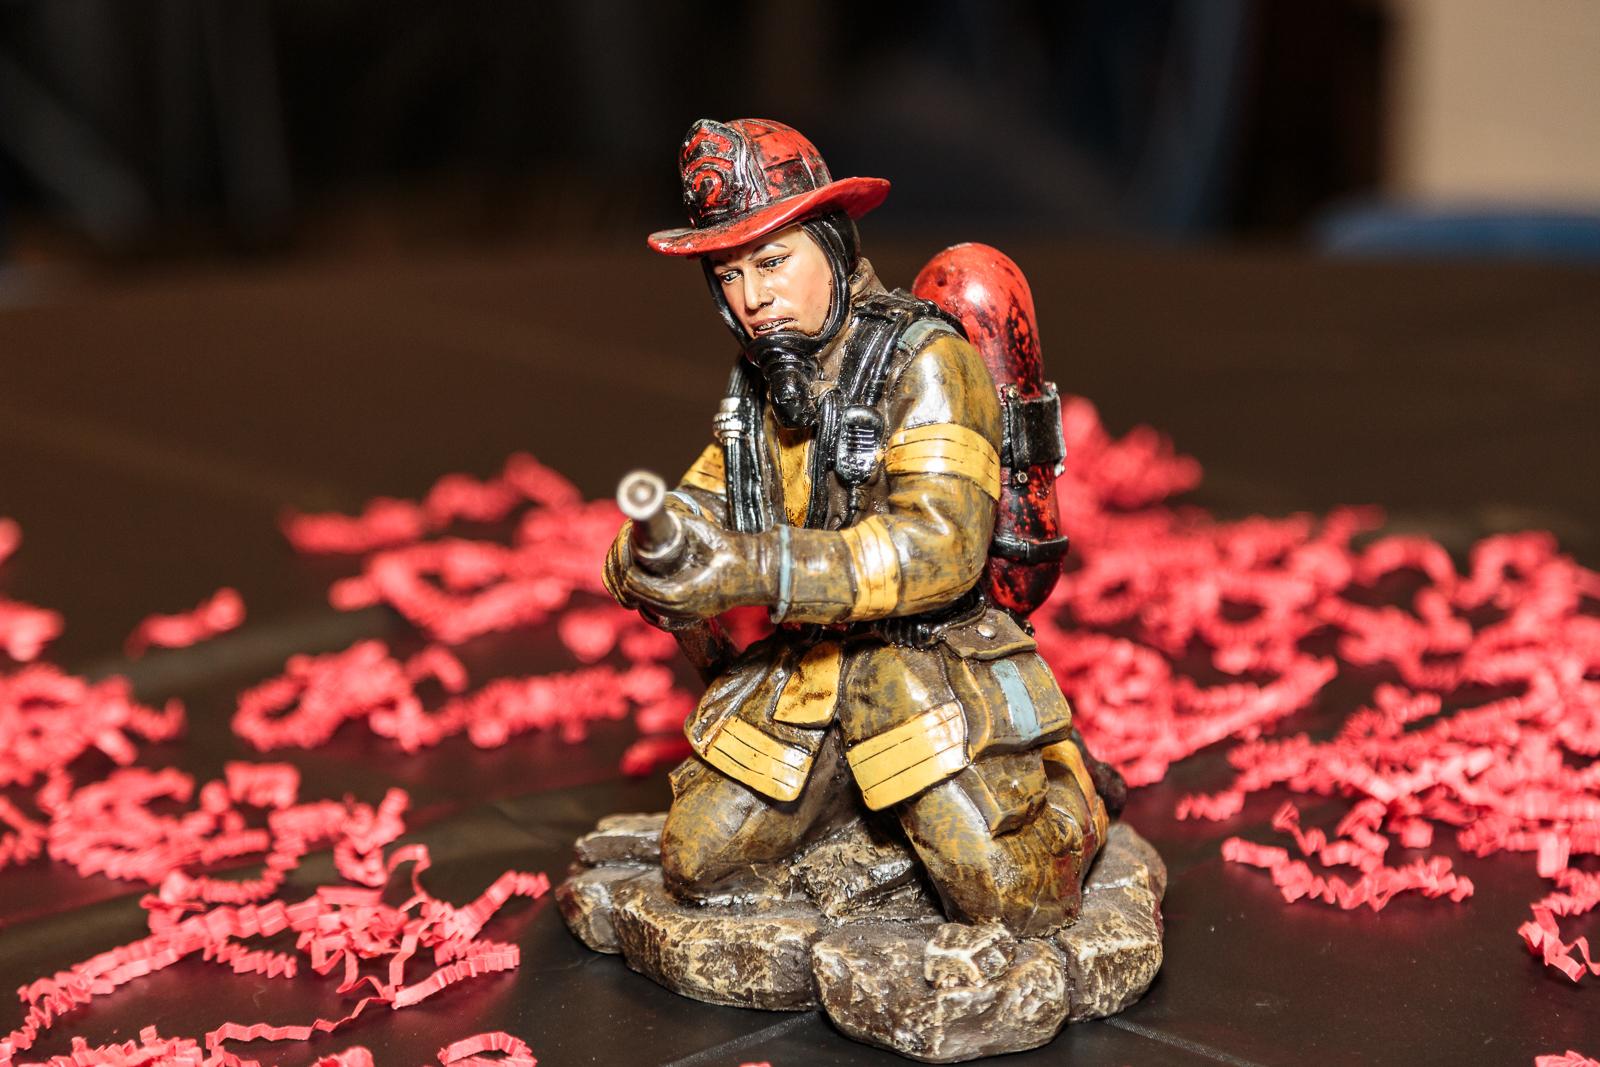 GCPS_PatrickES_Firefighters-122.jpg